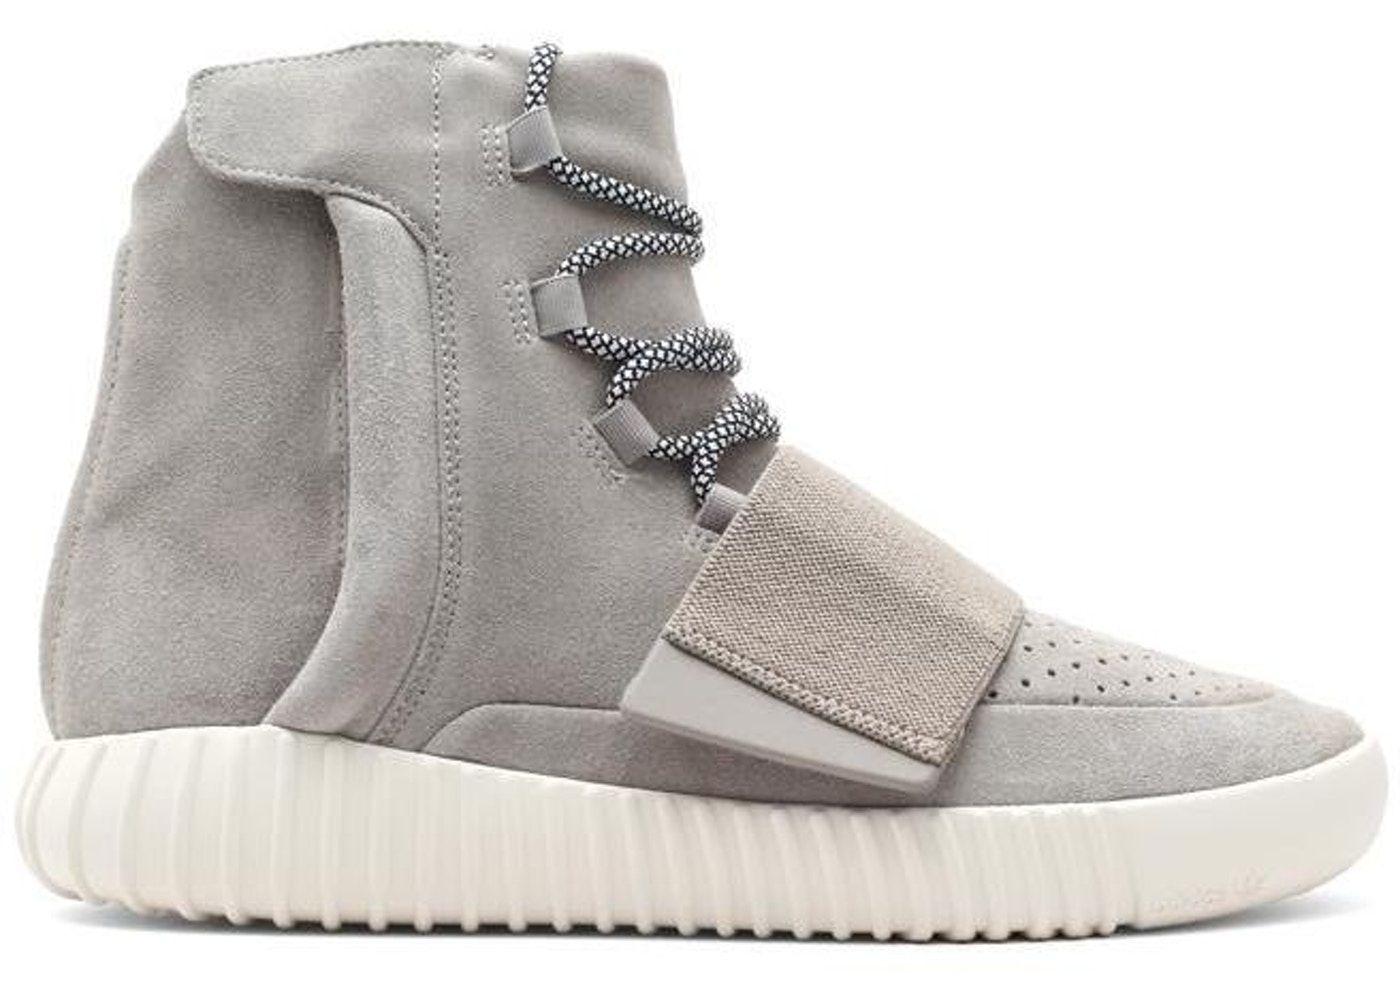 adidas Yeezy Boost 750 OG Light Brown